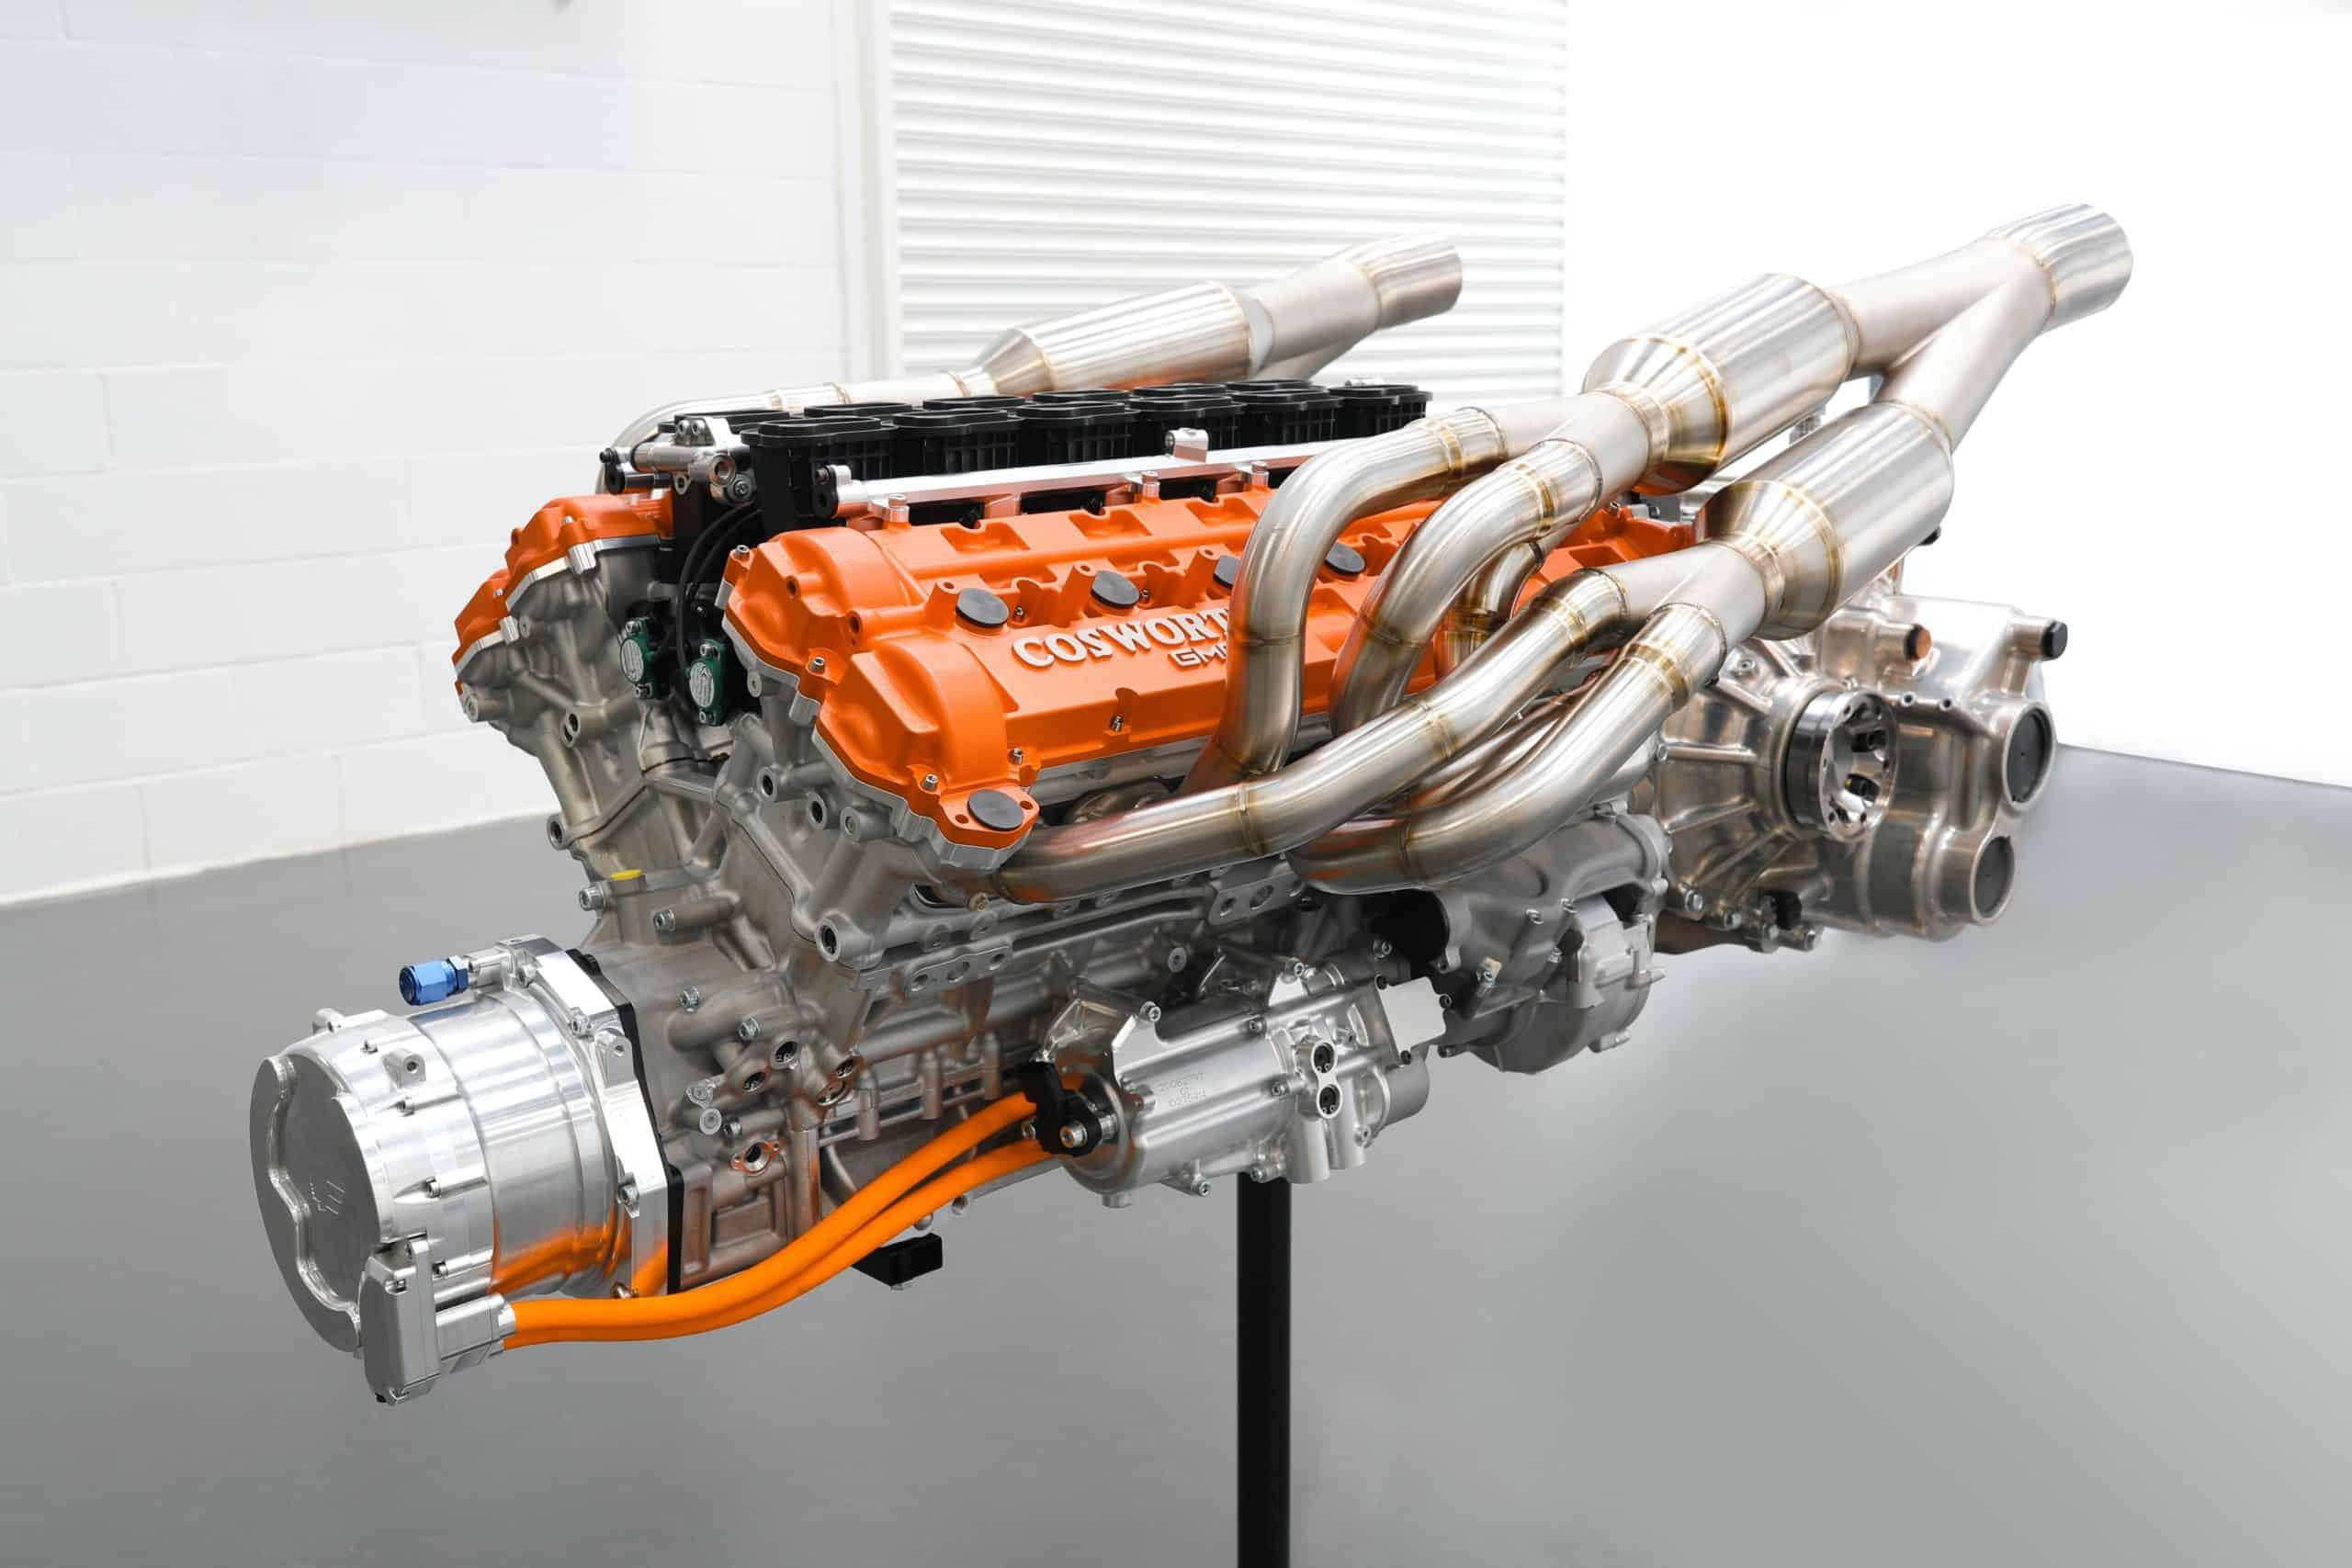 Cosworth GMA T.50 V12 engine